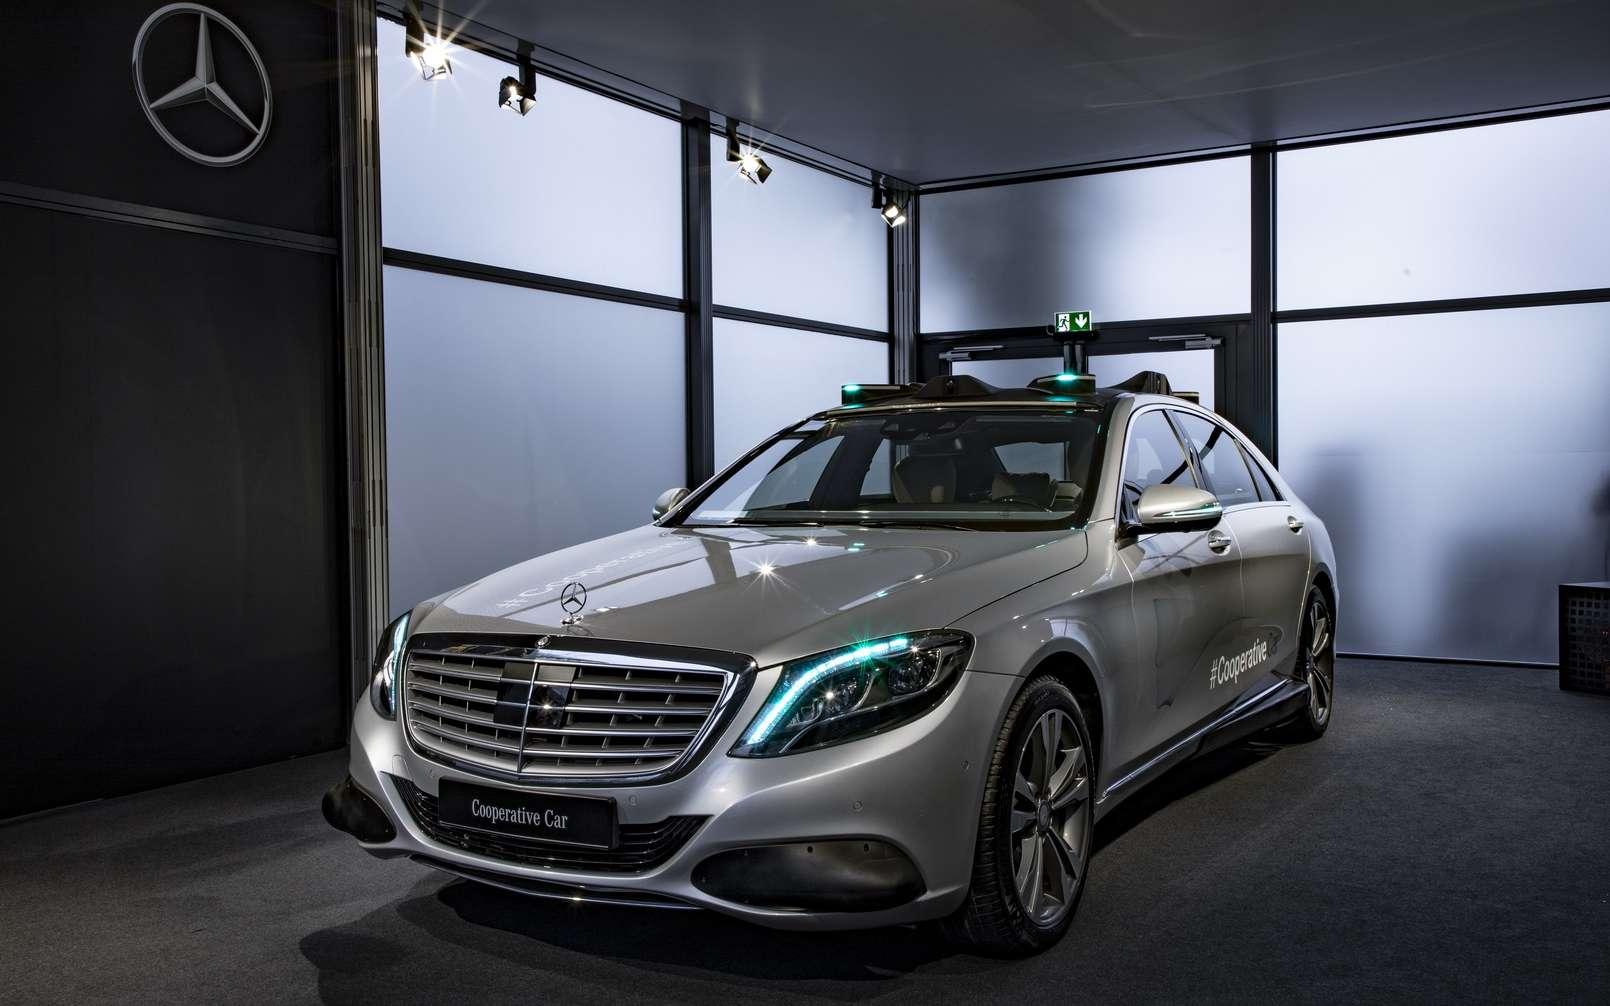 La voiture autonome « coopérative » selon Mercedes-Benz. © Daimler